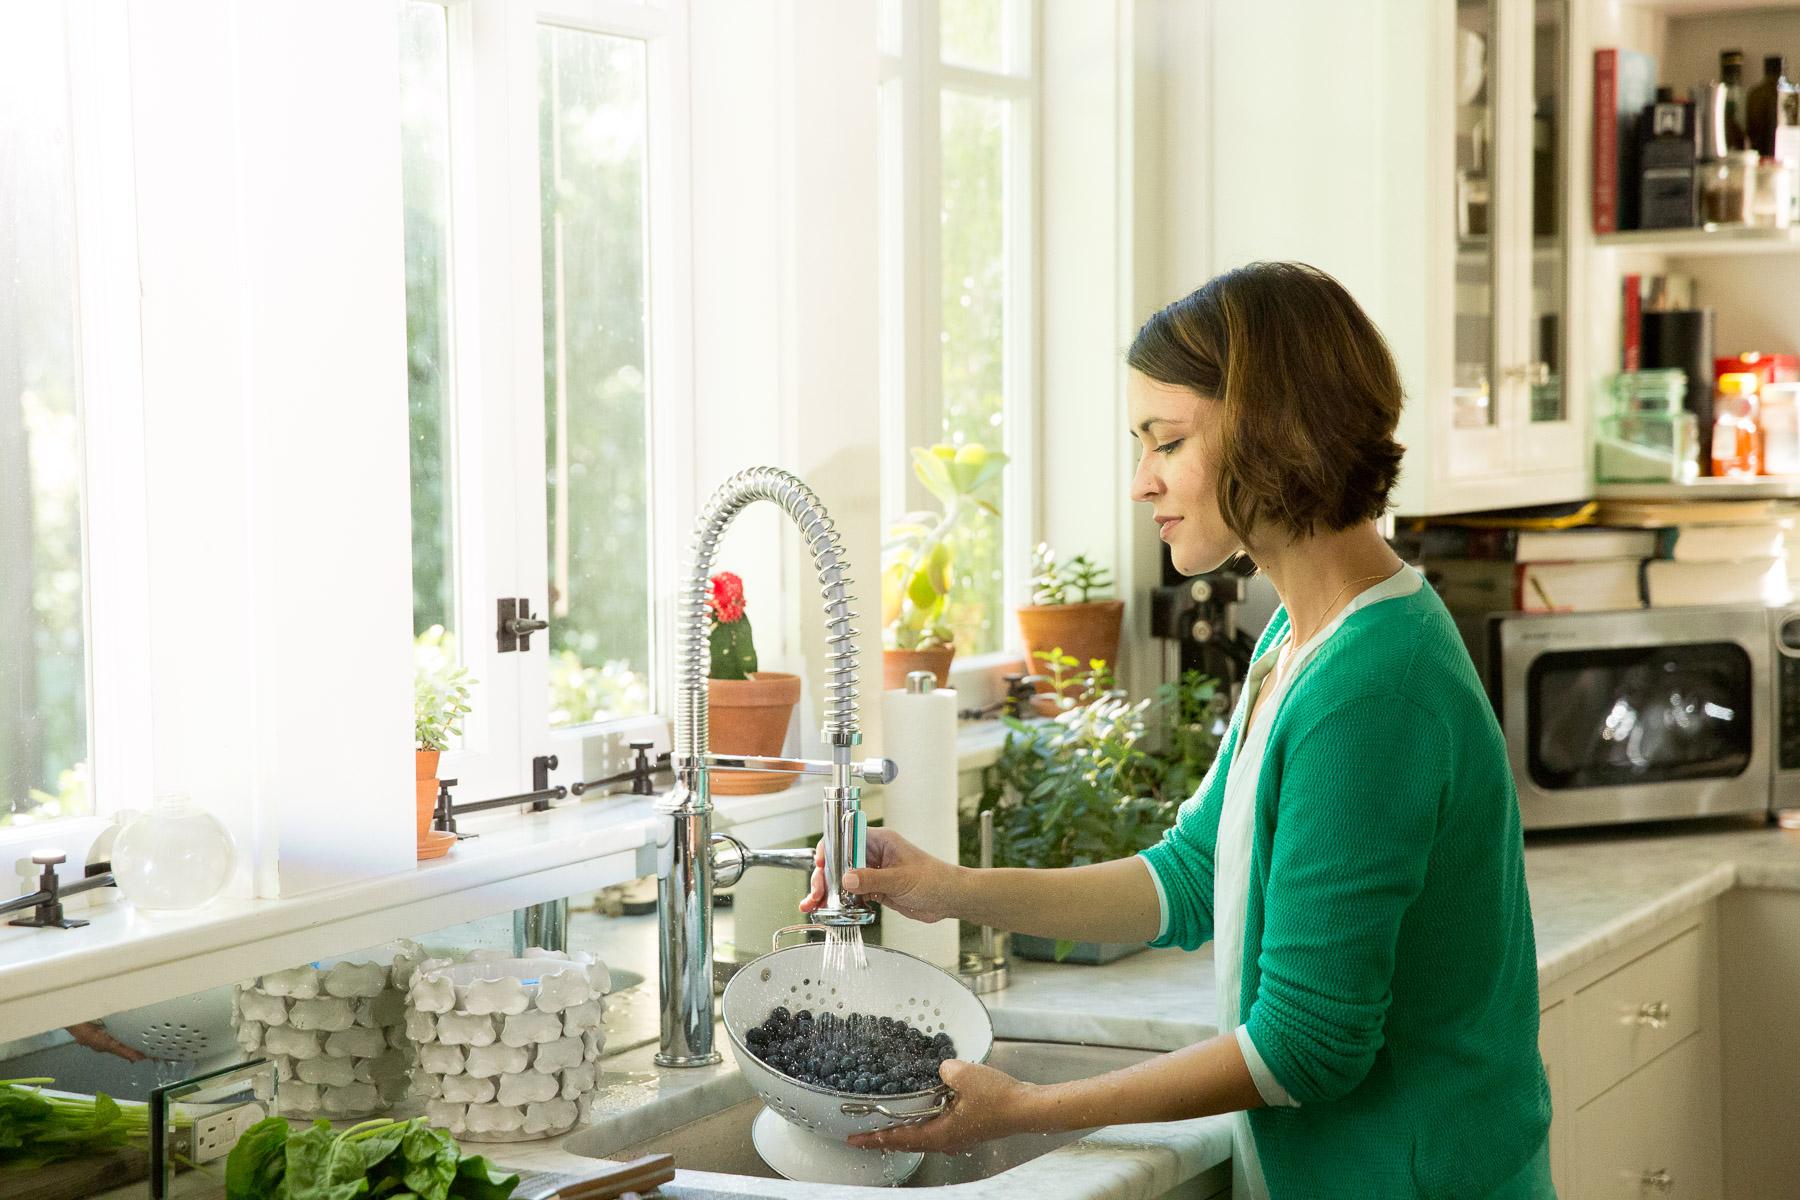 woman-preparing-organic-food-kitchen.jpg